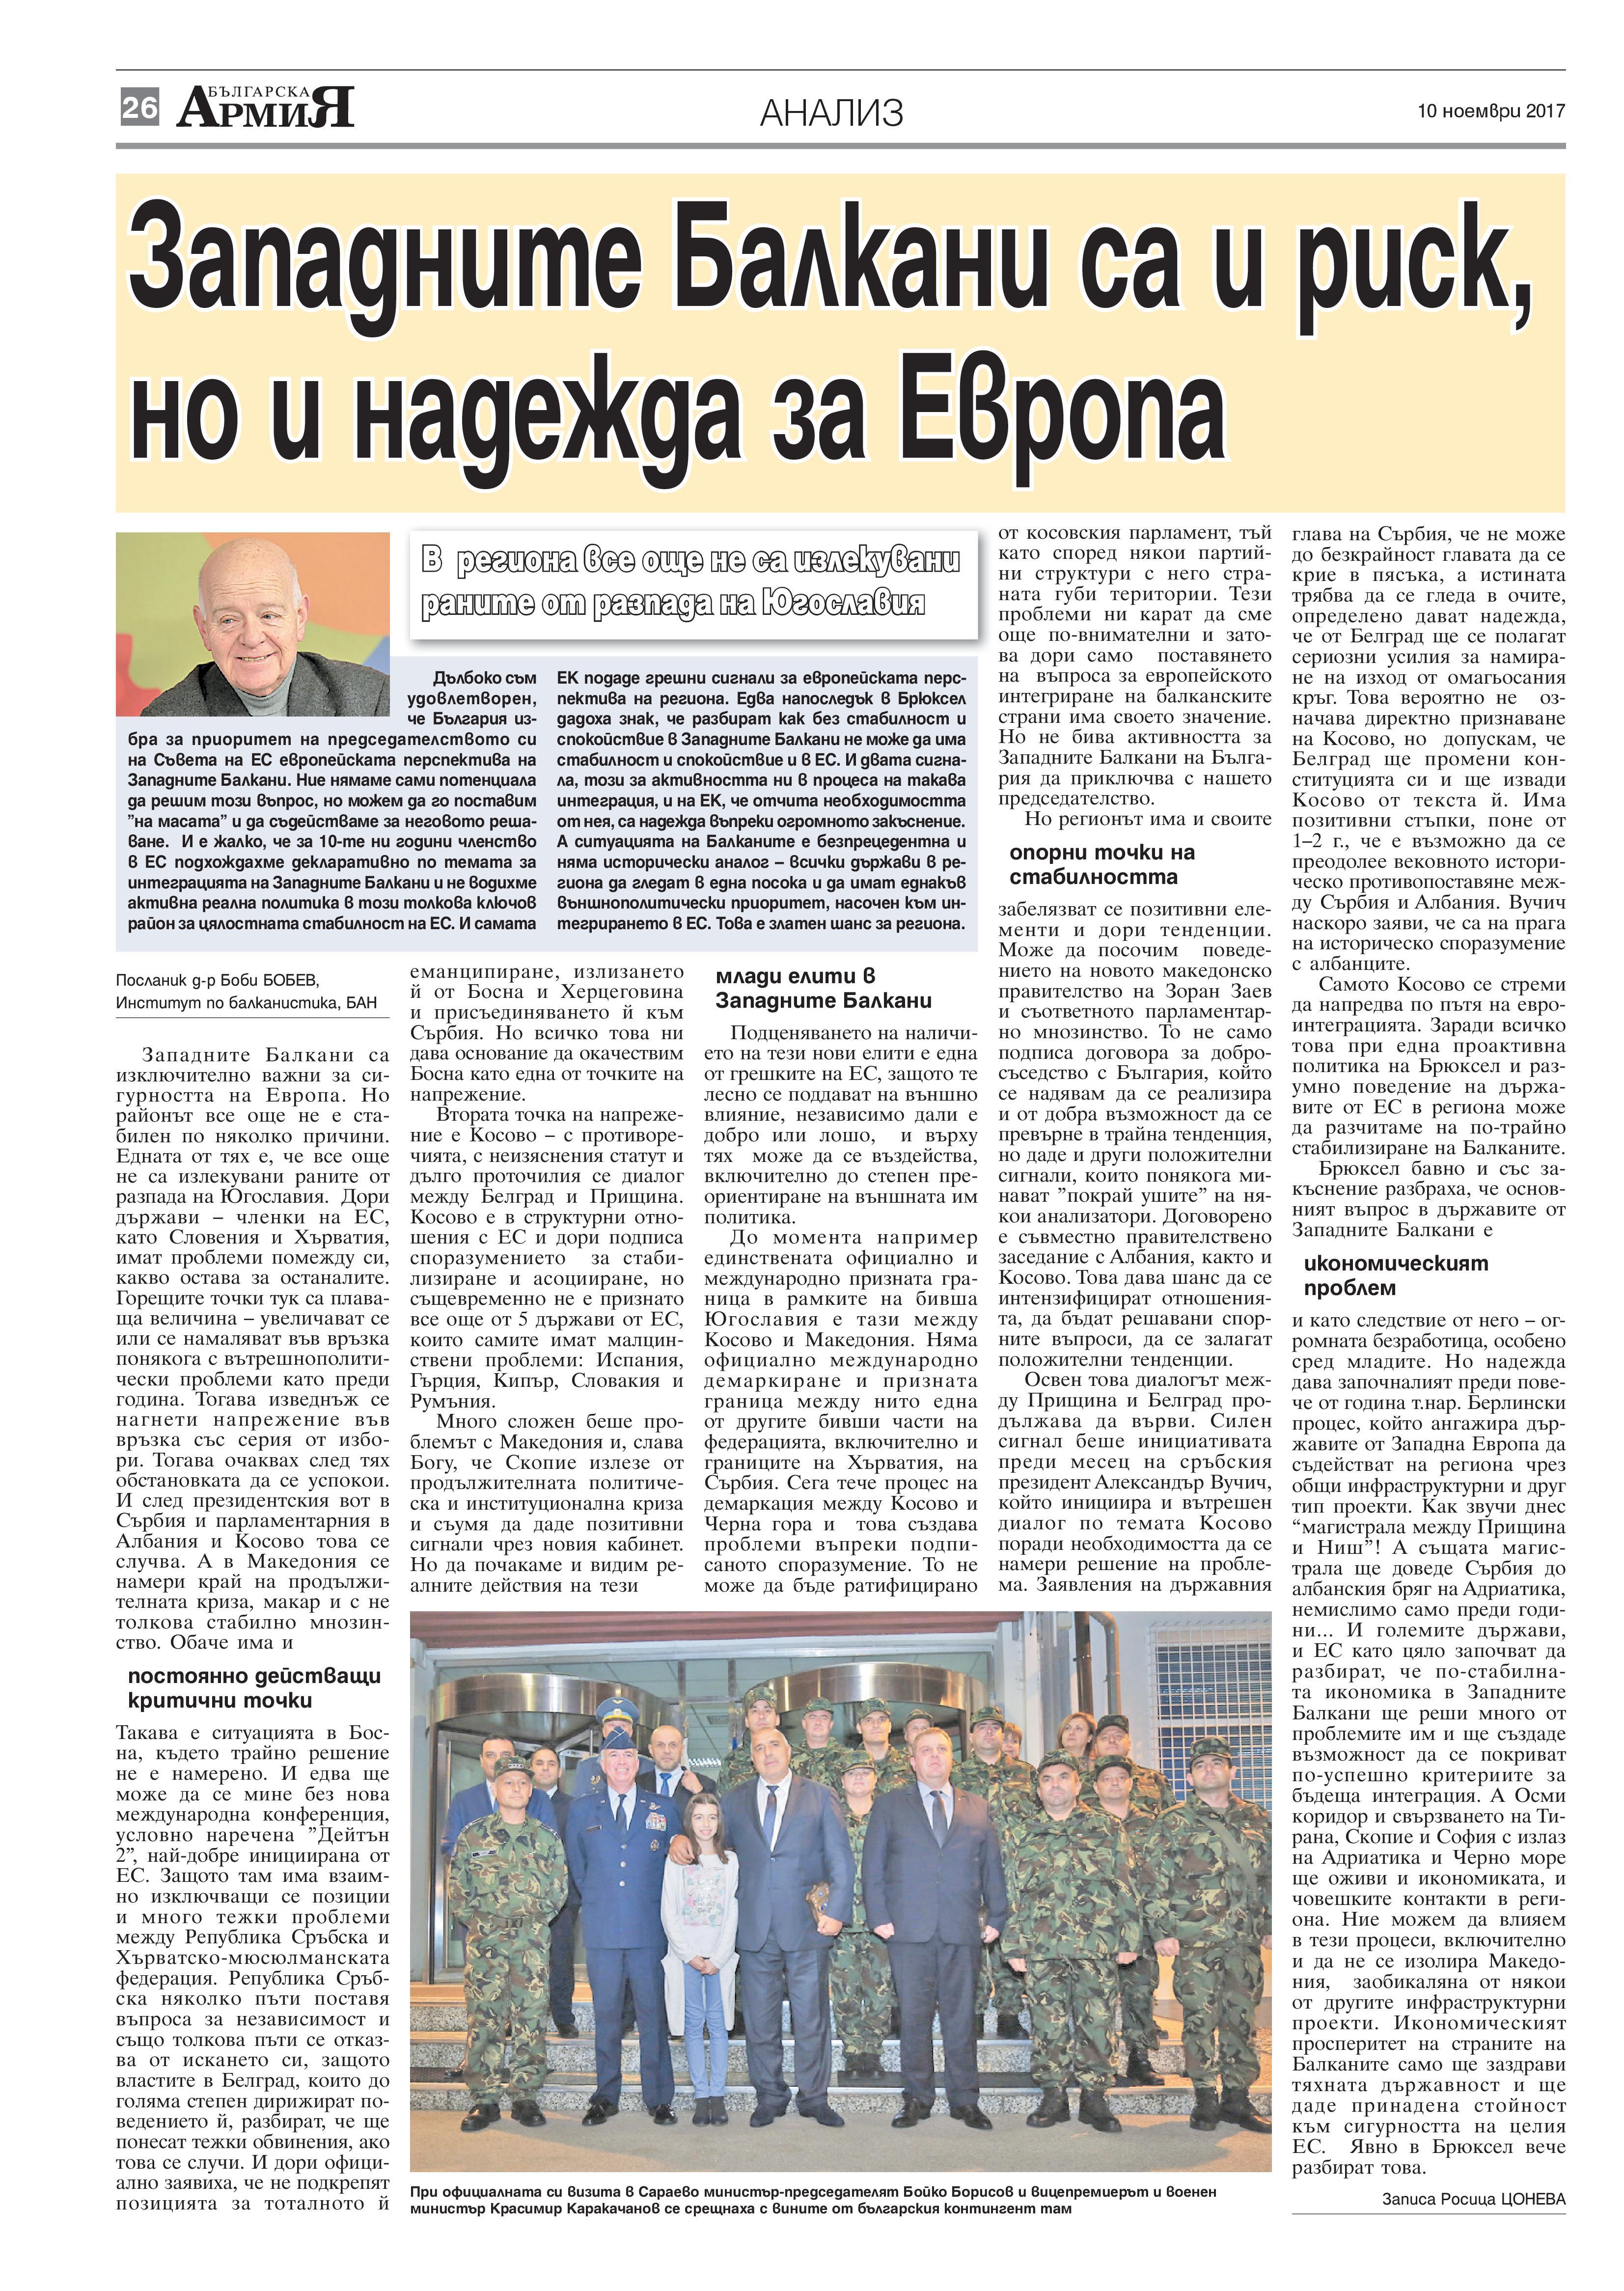 http://armymedia.bg/wp-content/uploads/2015/06/26-11.jpg